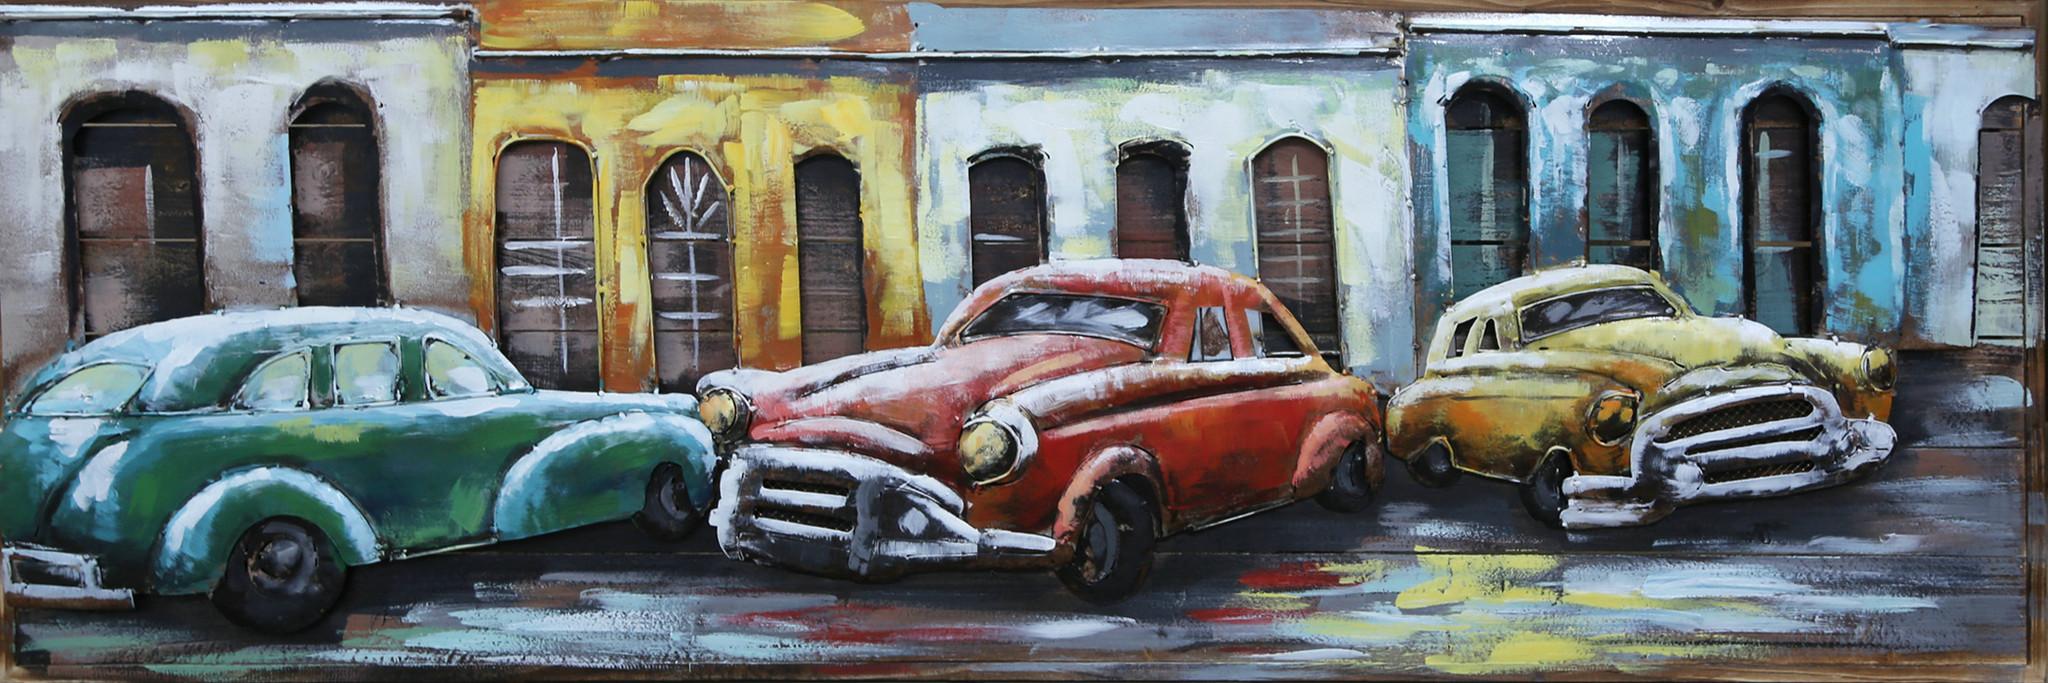 Eliassen Metal painting Three Cars 50x150cm